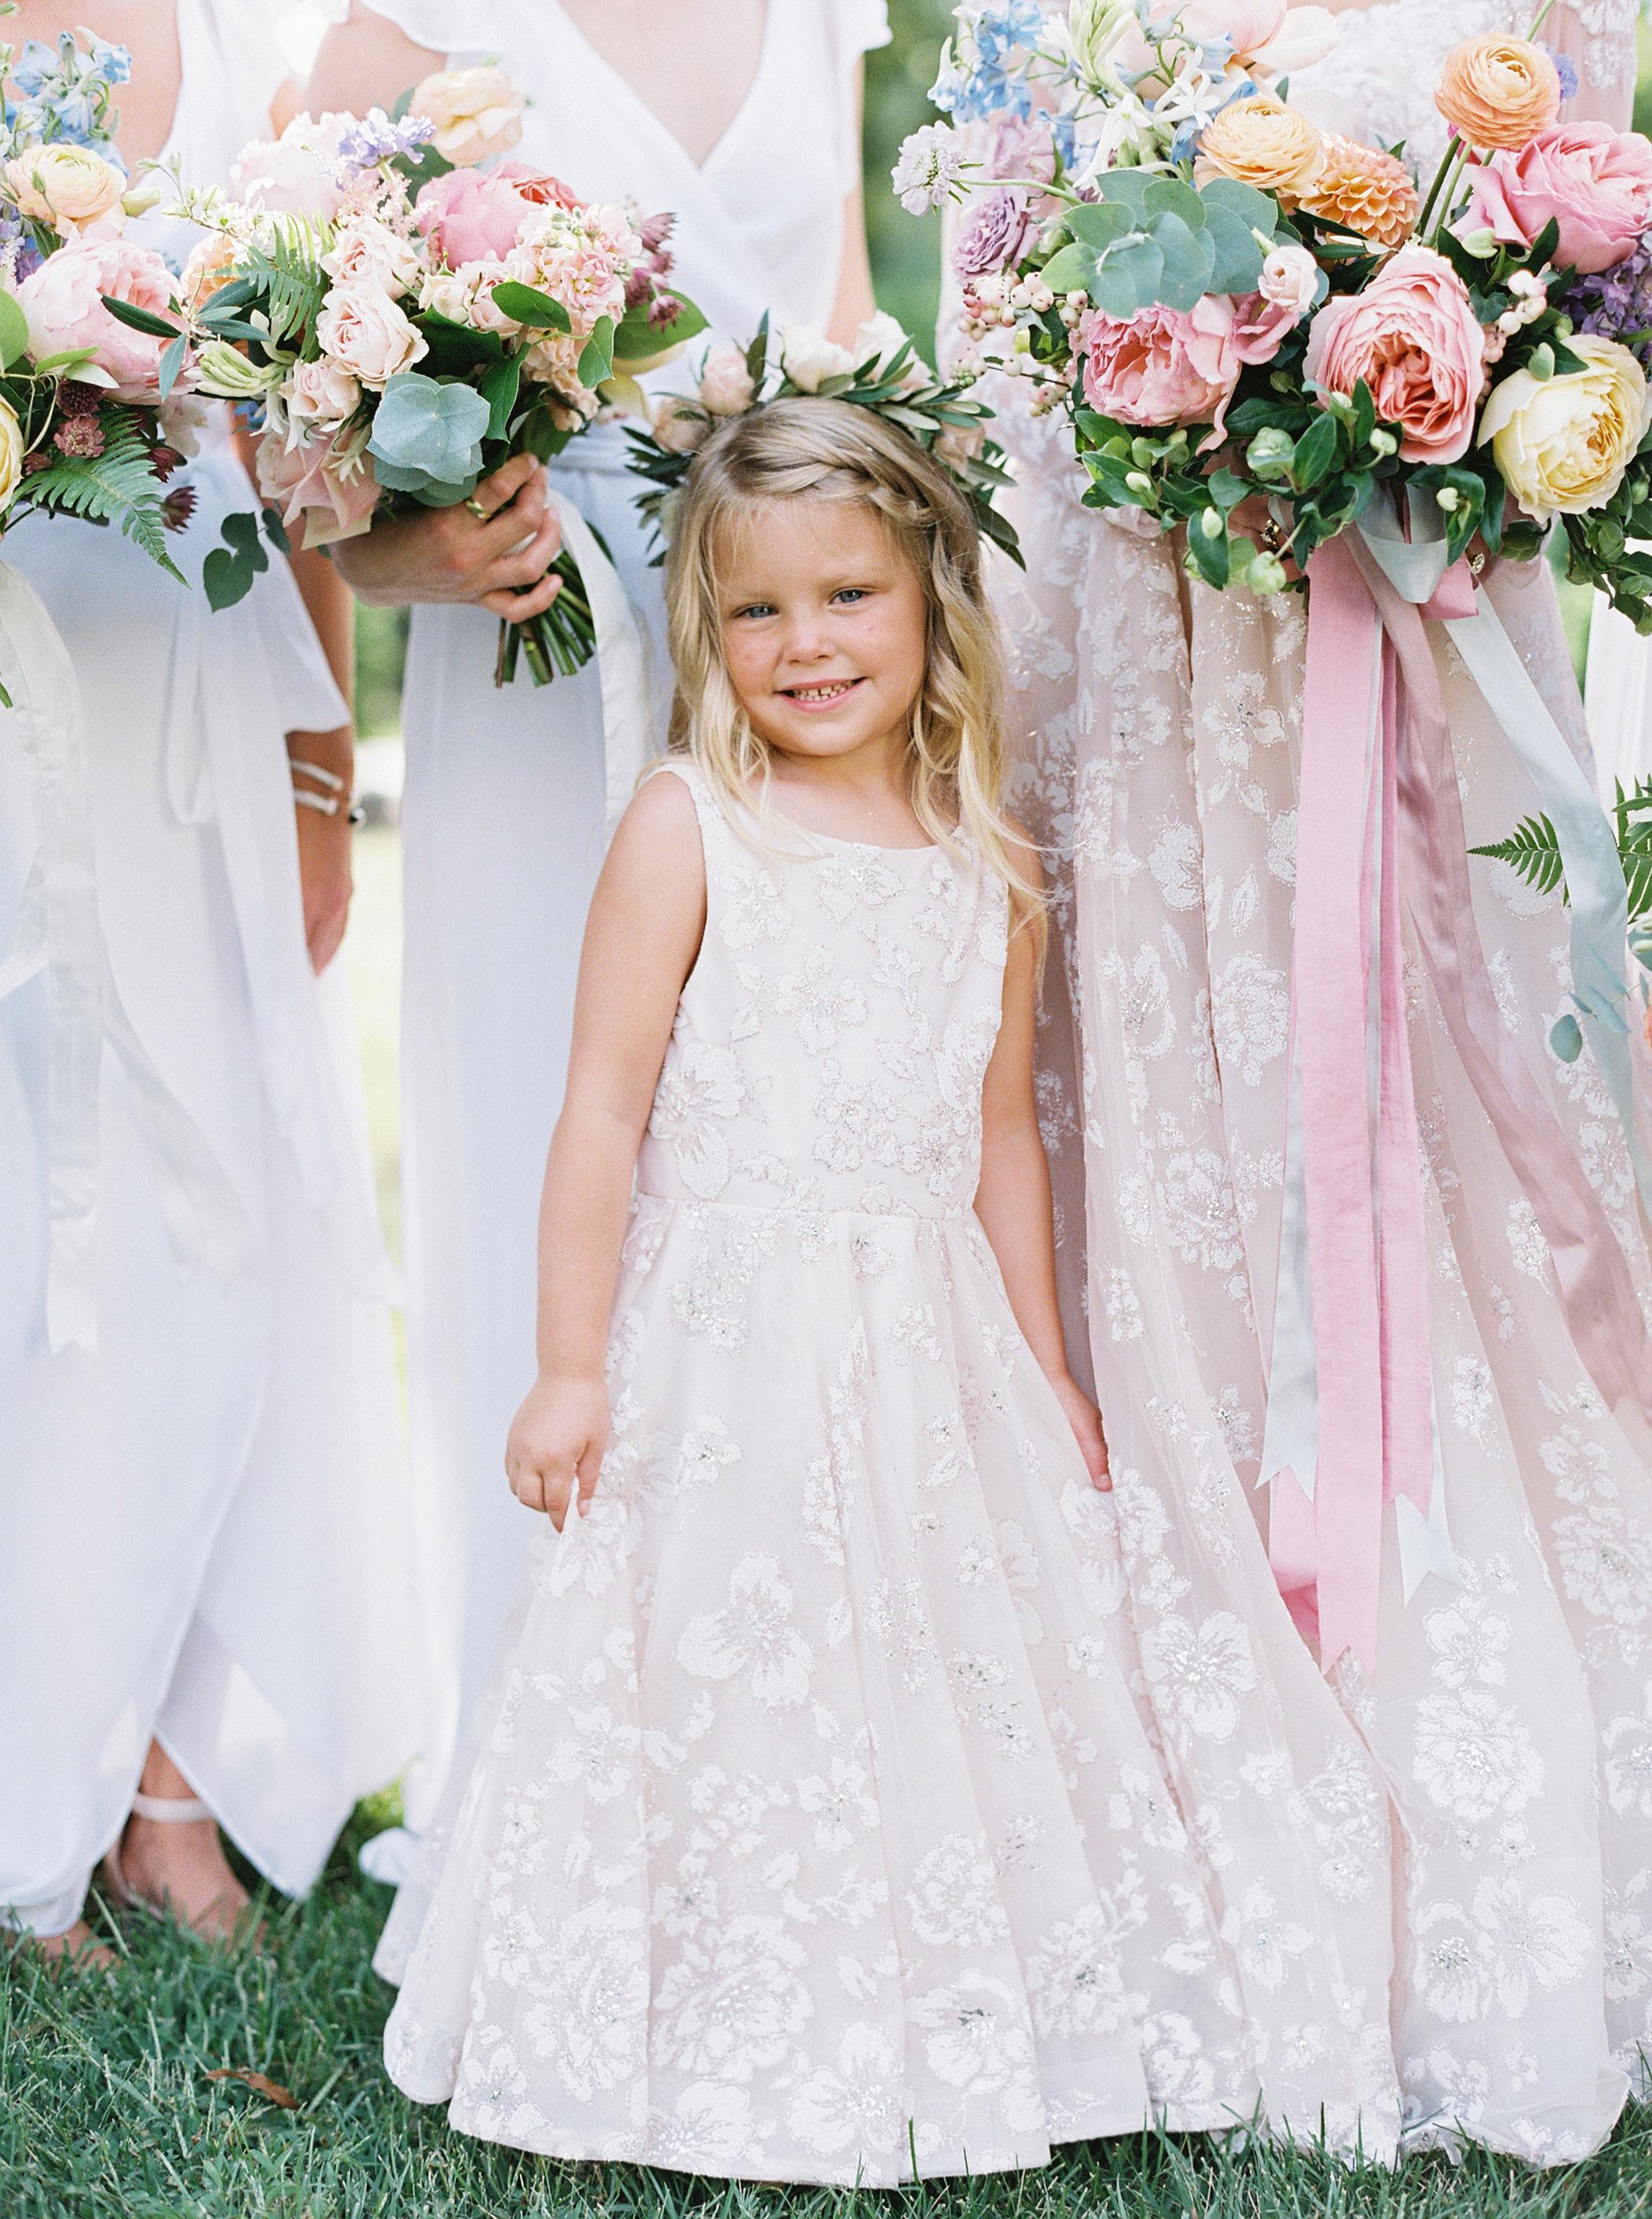 shelby preston wedding flower girl